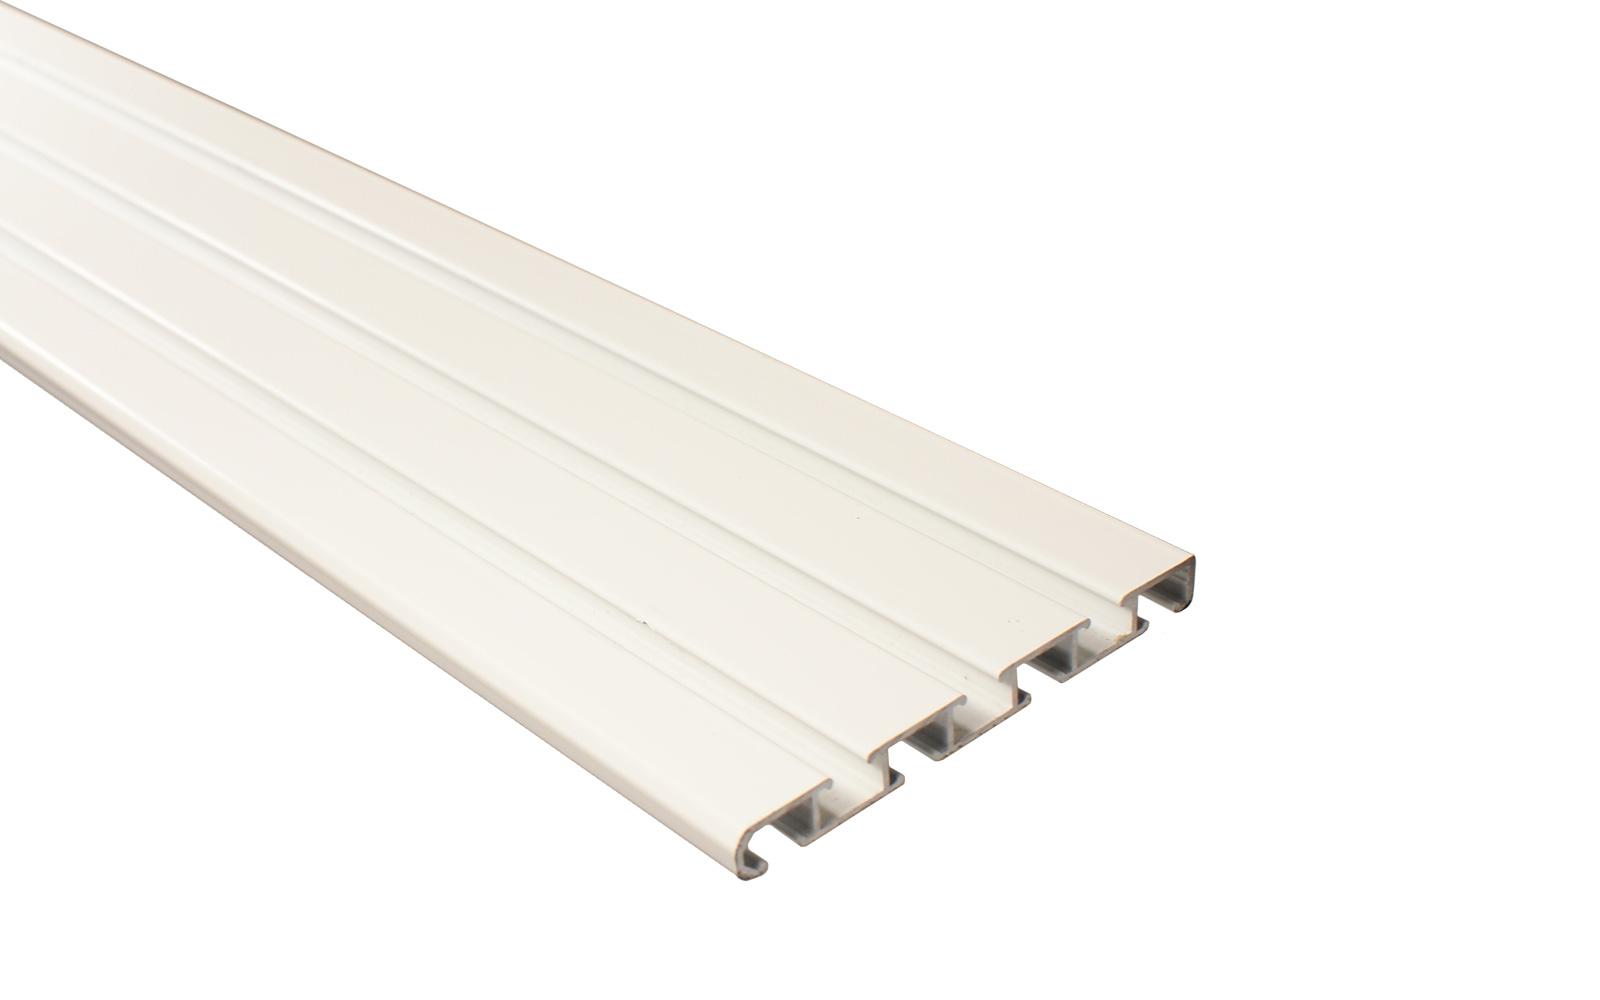 4 l ufige gardinenschiene aus aluminium wei. Black Bedroom Furniture Sets. Home Design Ideas